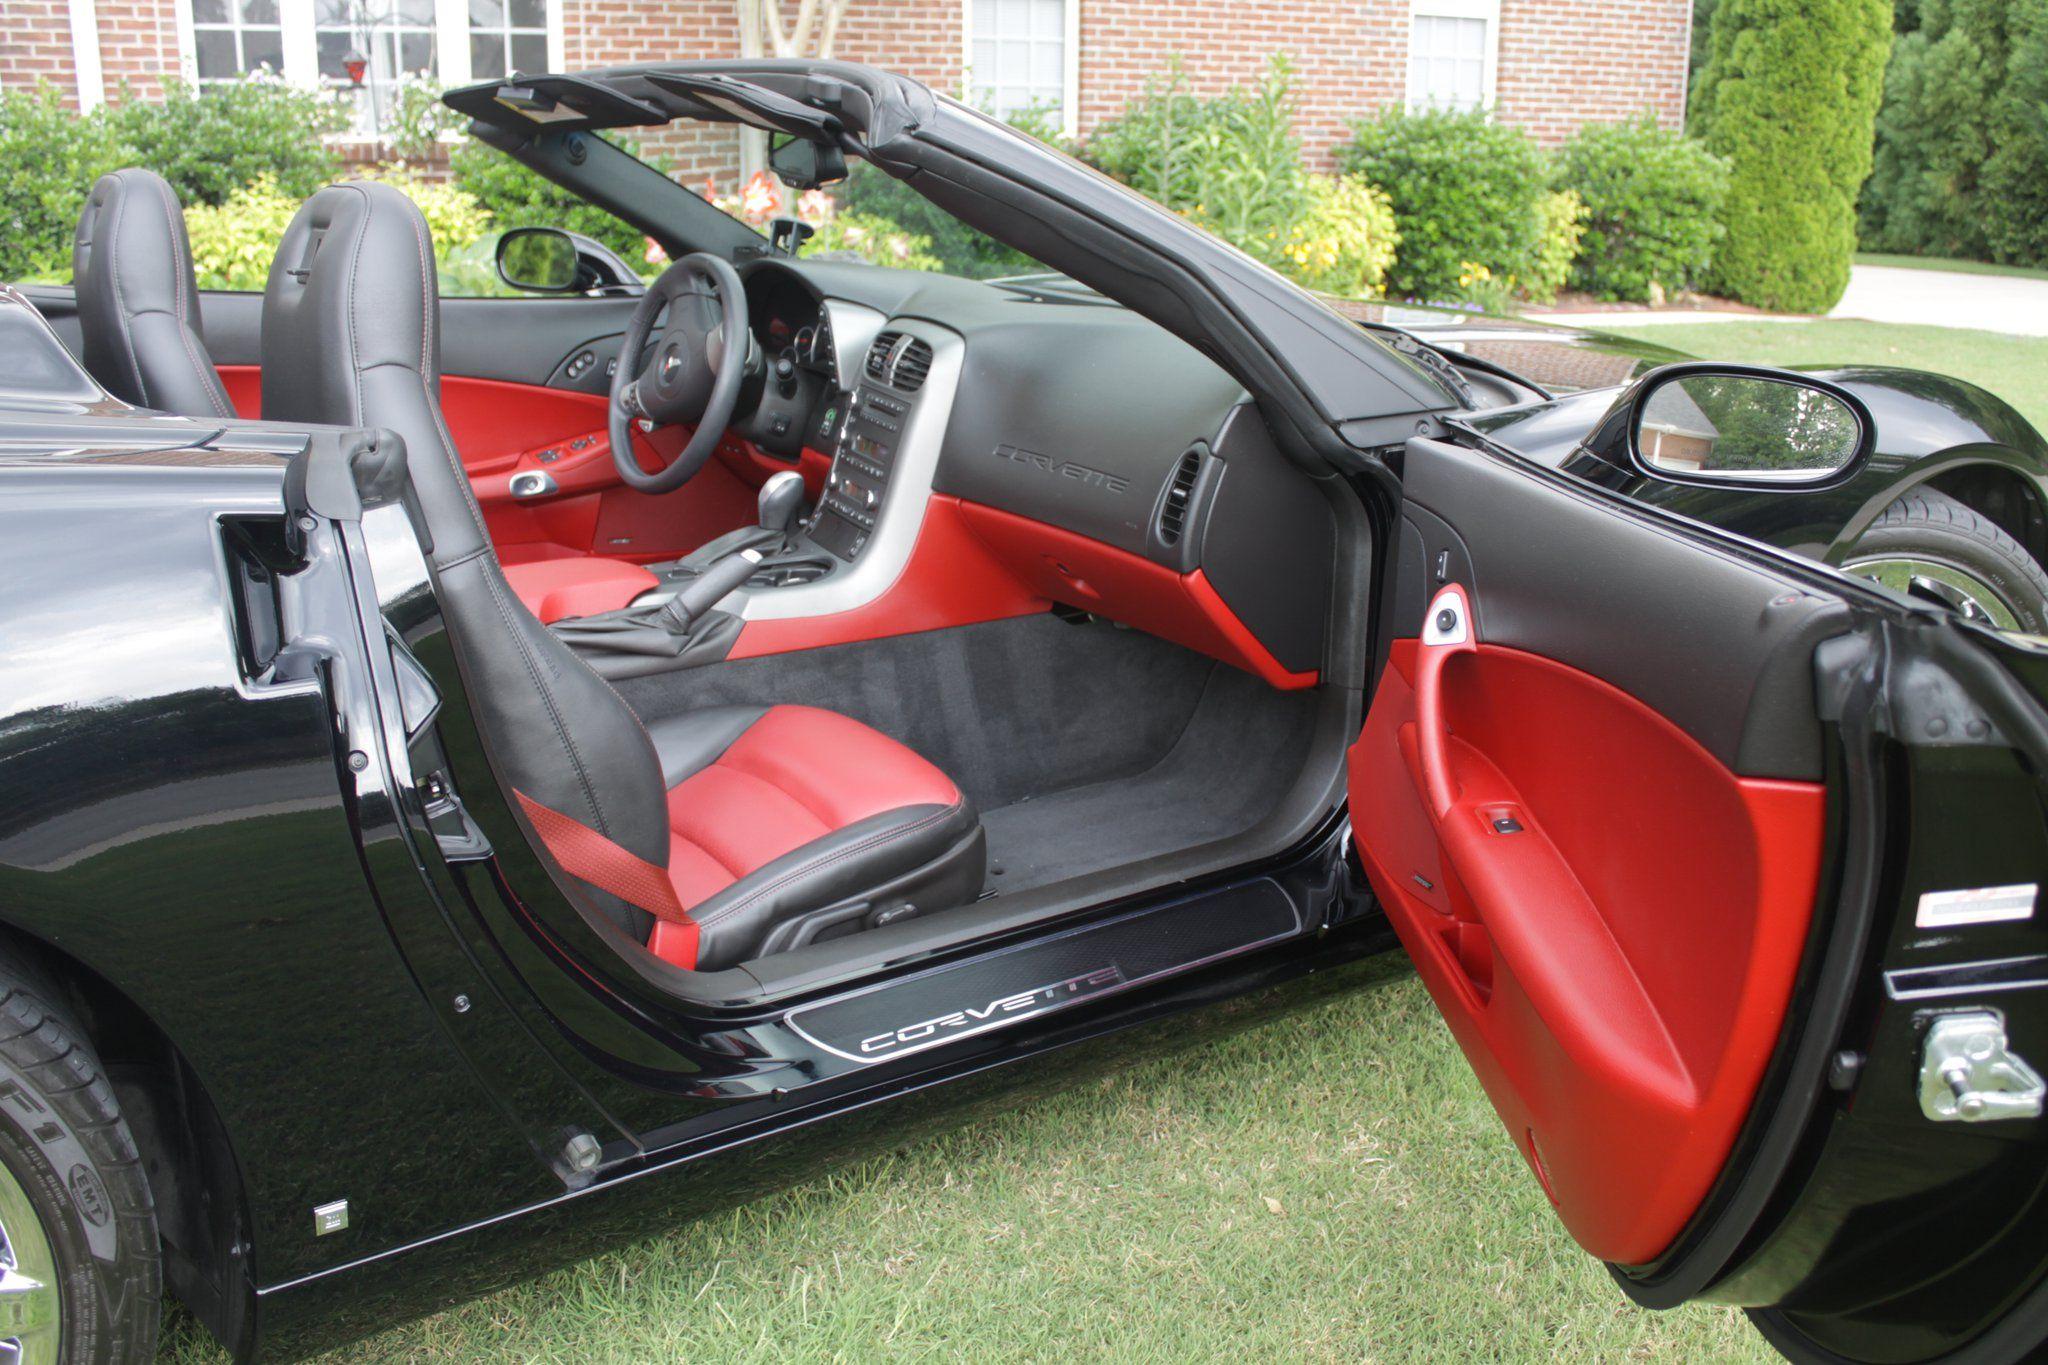 Awesome black red interior of c6 corvette corvette